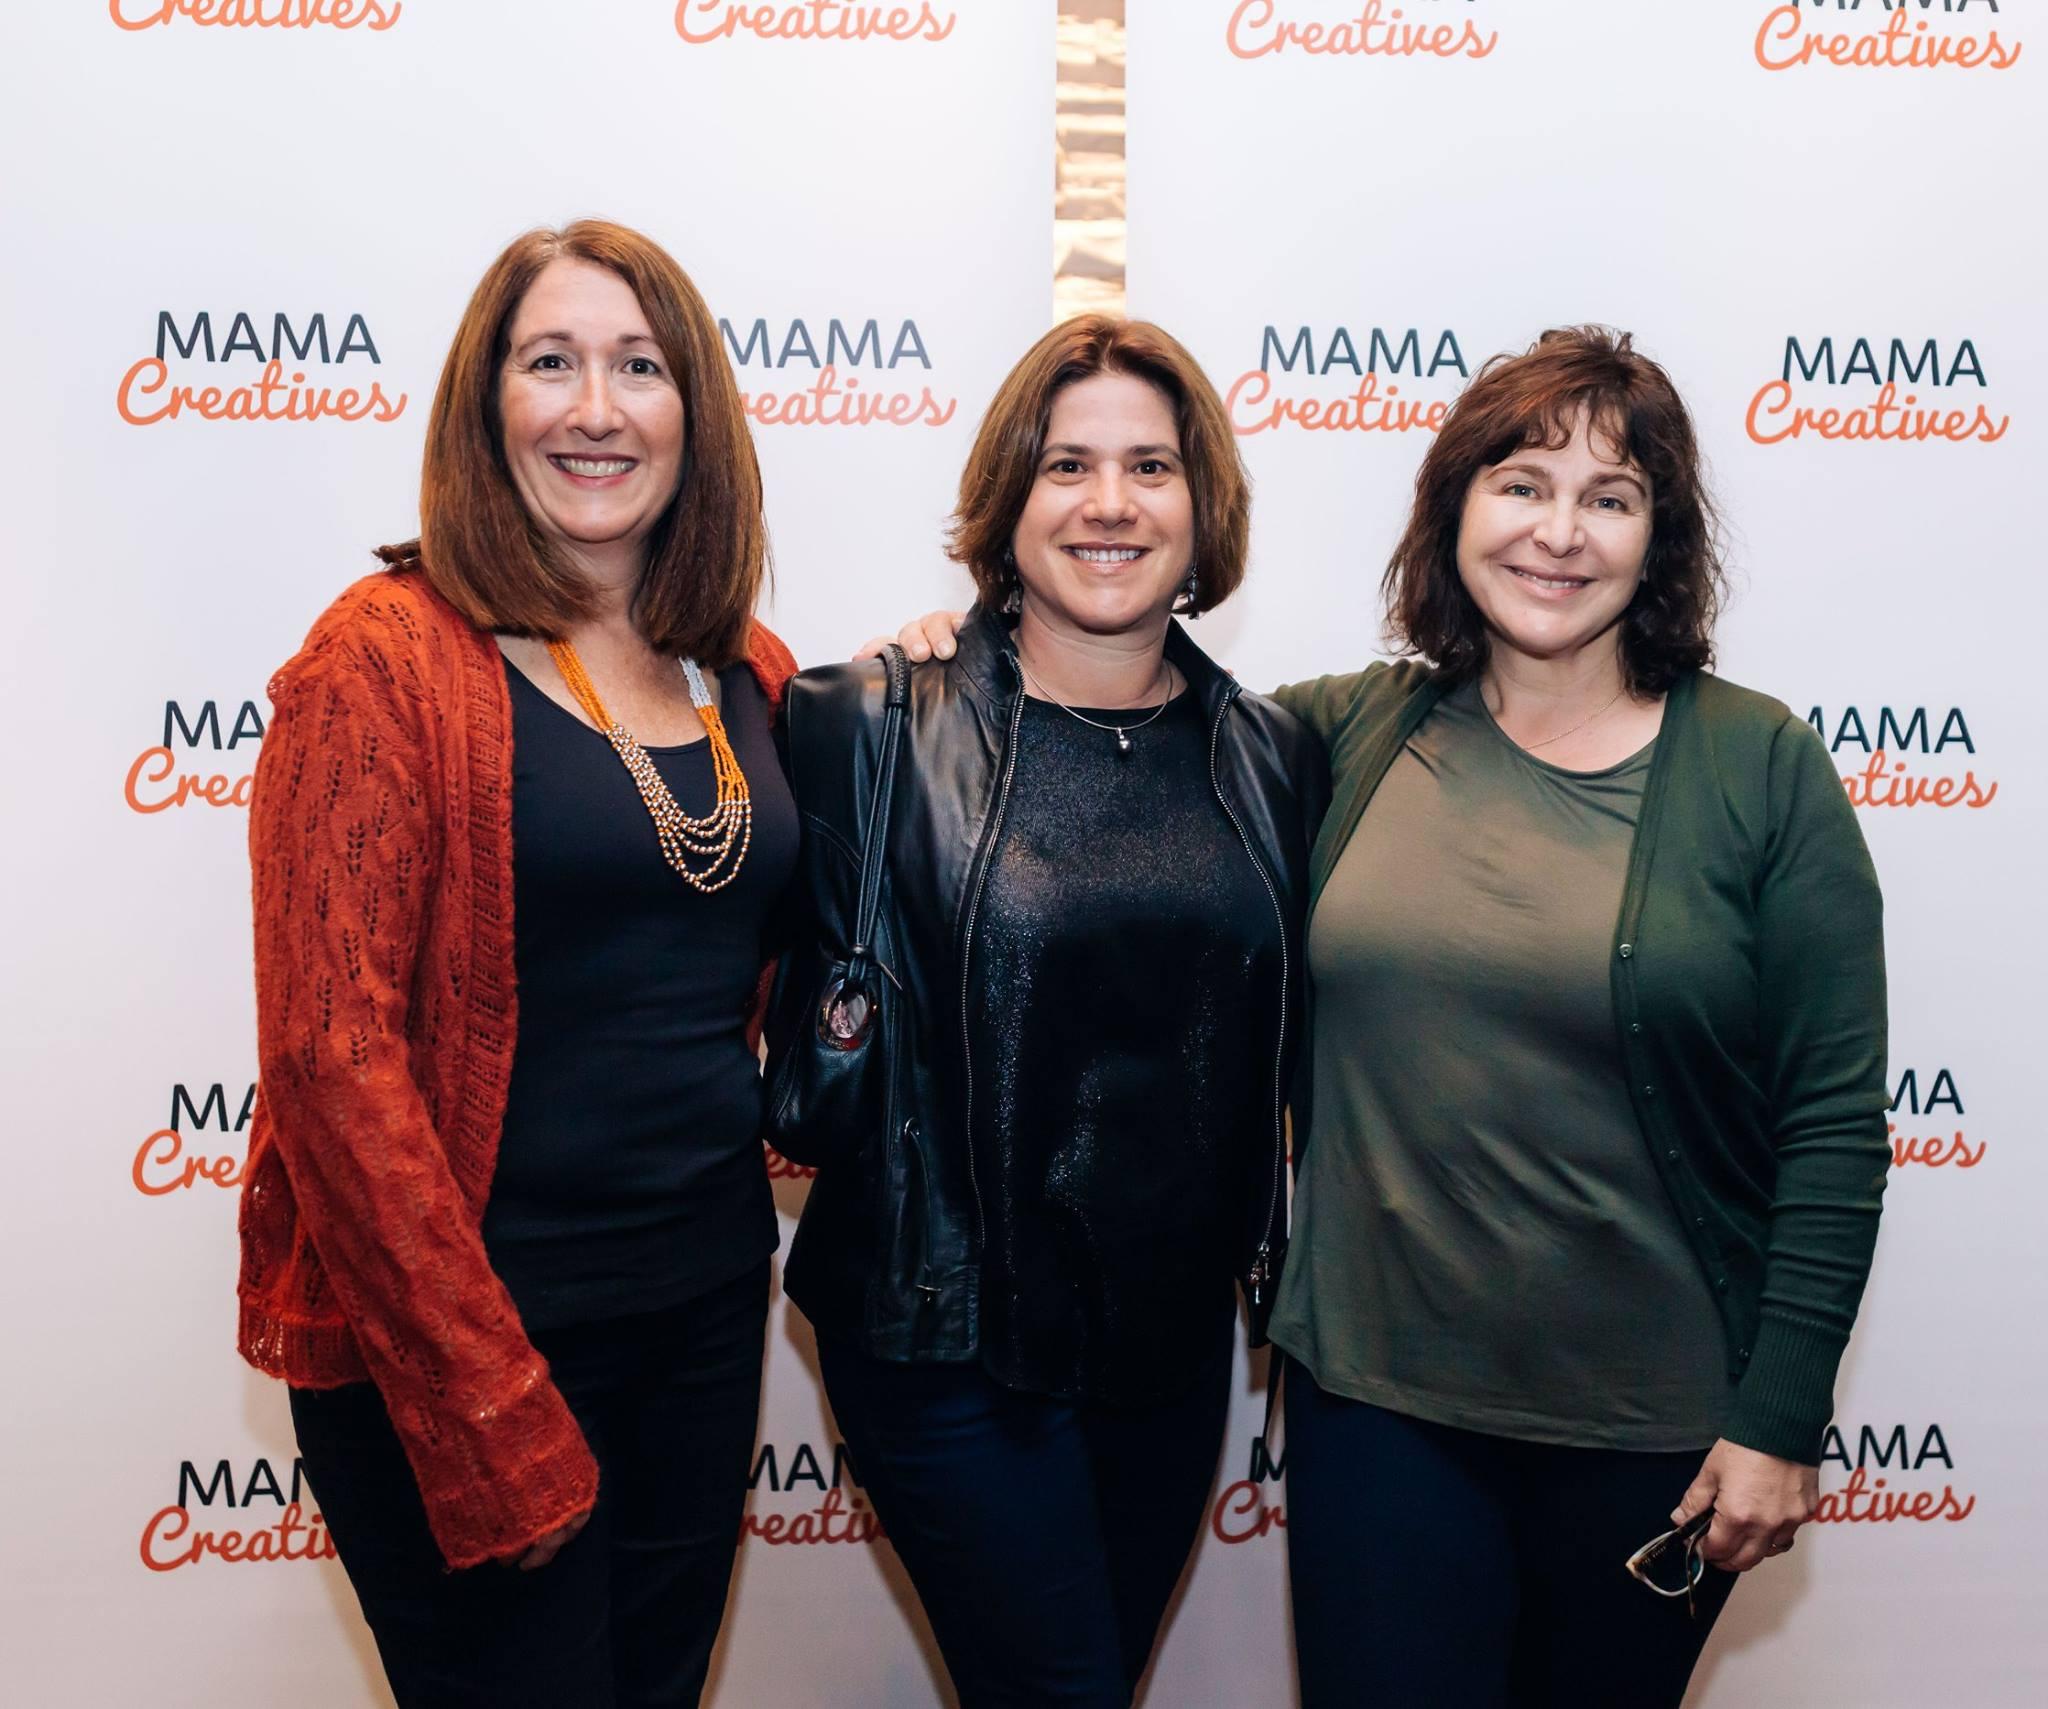 Three fabulous mamas who enjoyed our inspiring Mama Creatives Mother's Day Celebration with Zoe Bingley-Pullin.